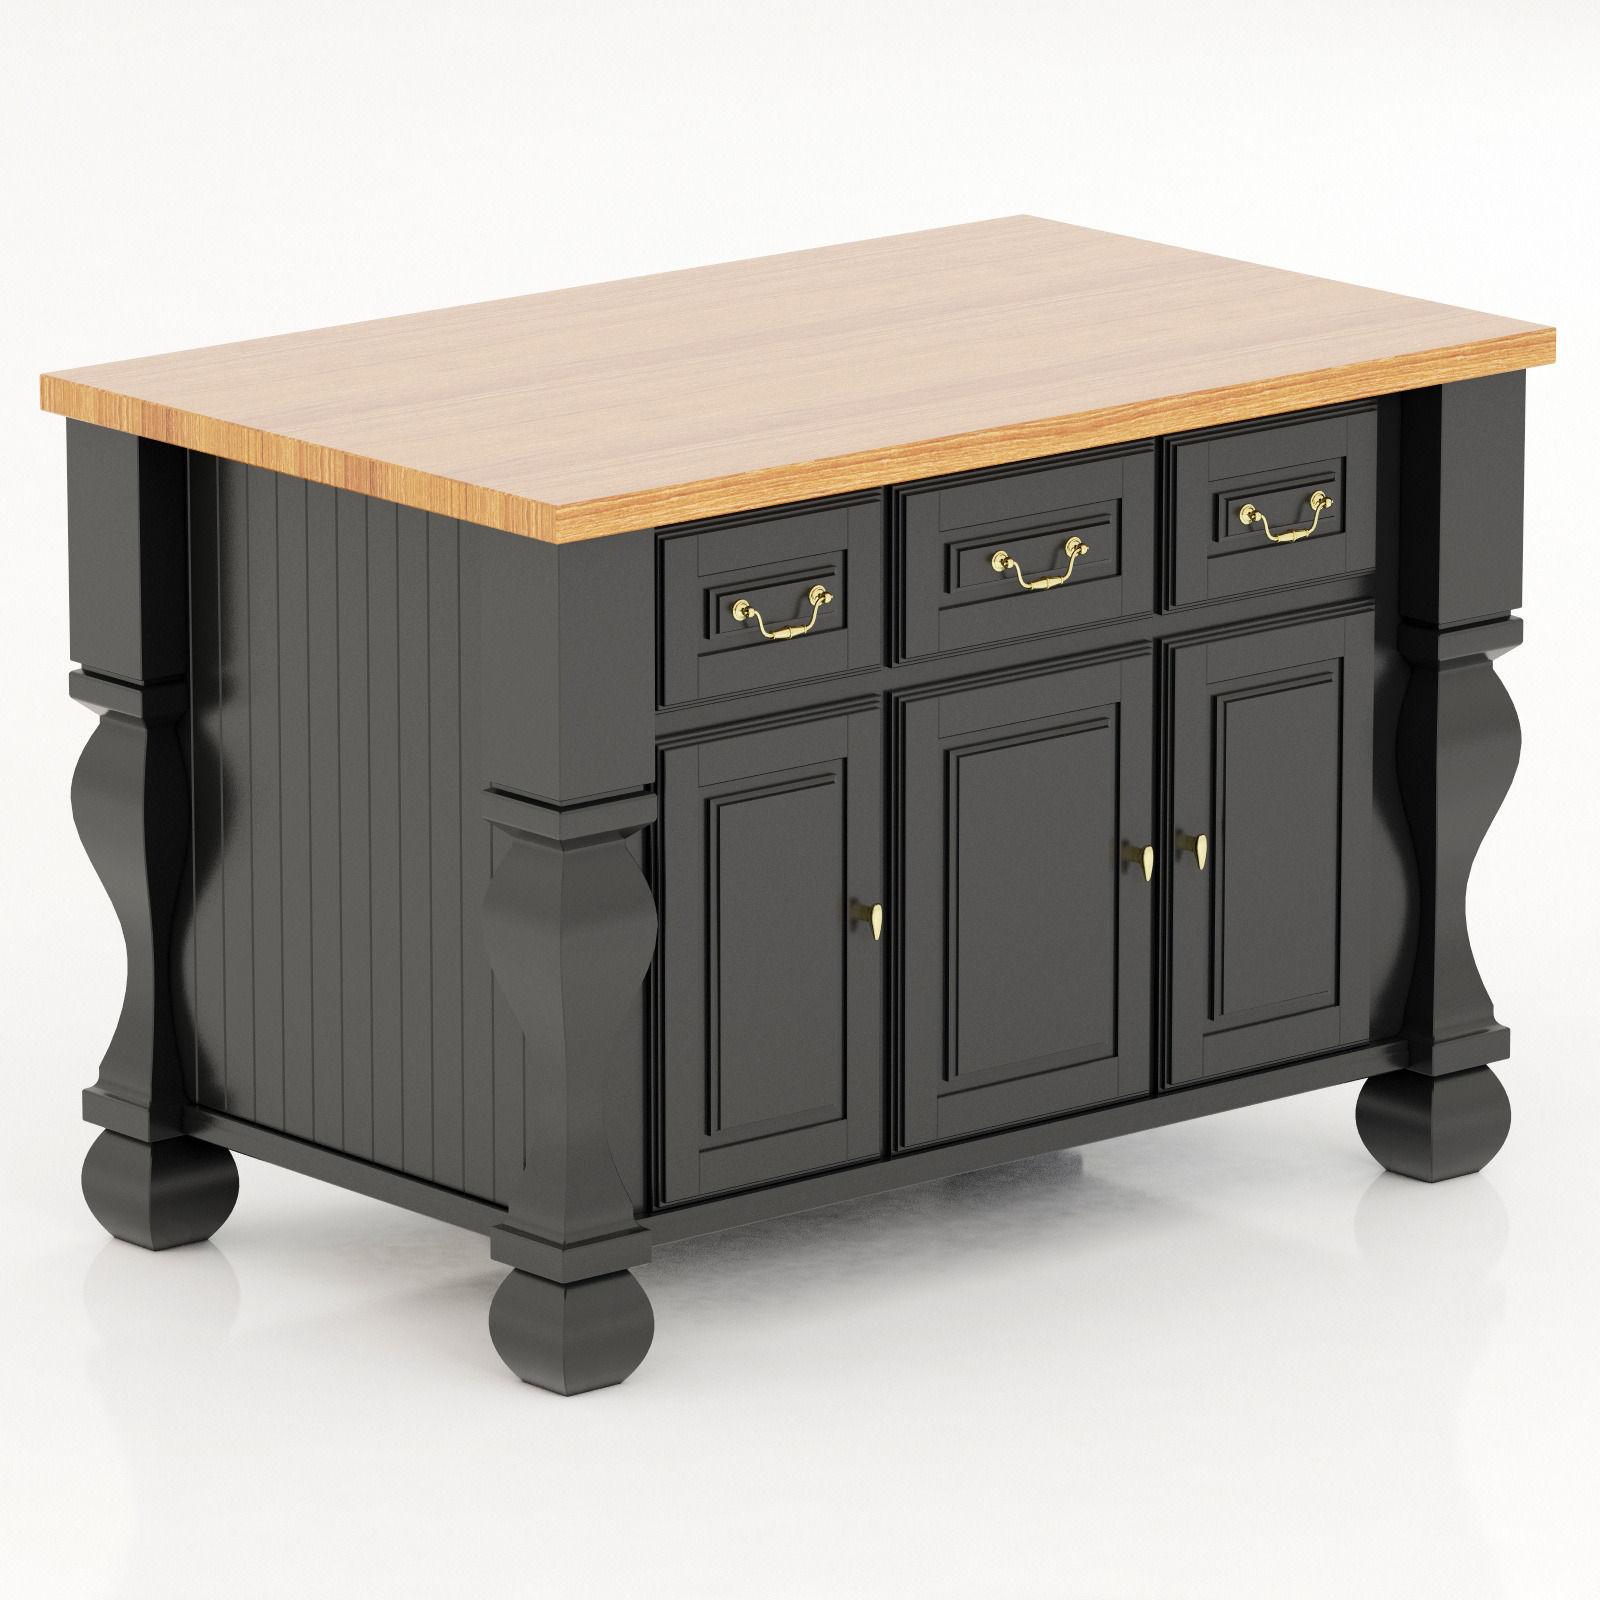 Kitchen island lyn design - Lyn Design By Hardware Resources Tuscan Kitchen Island 3d